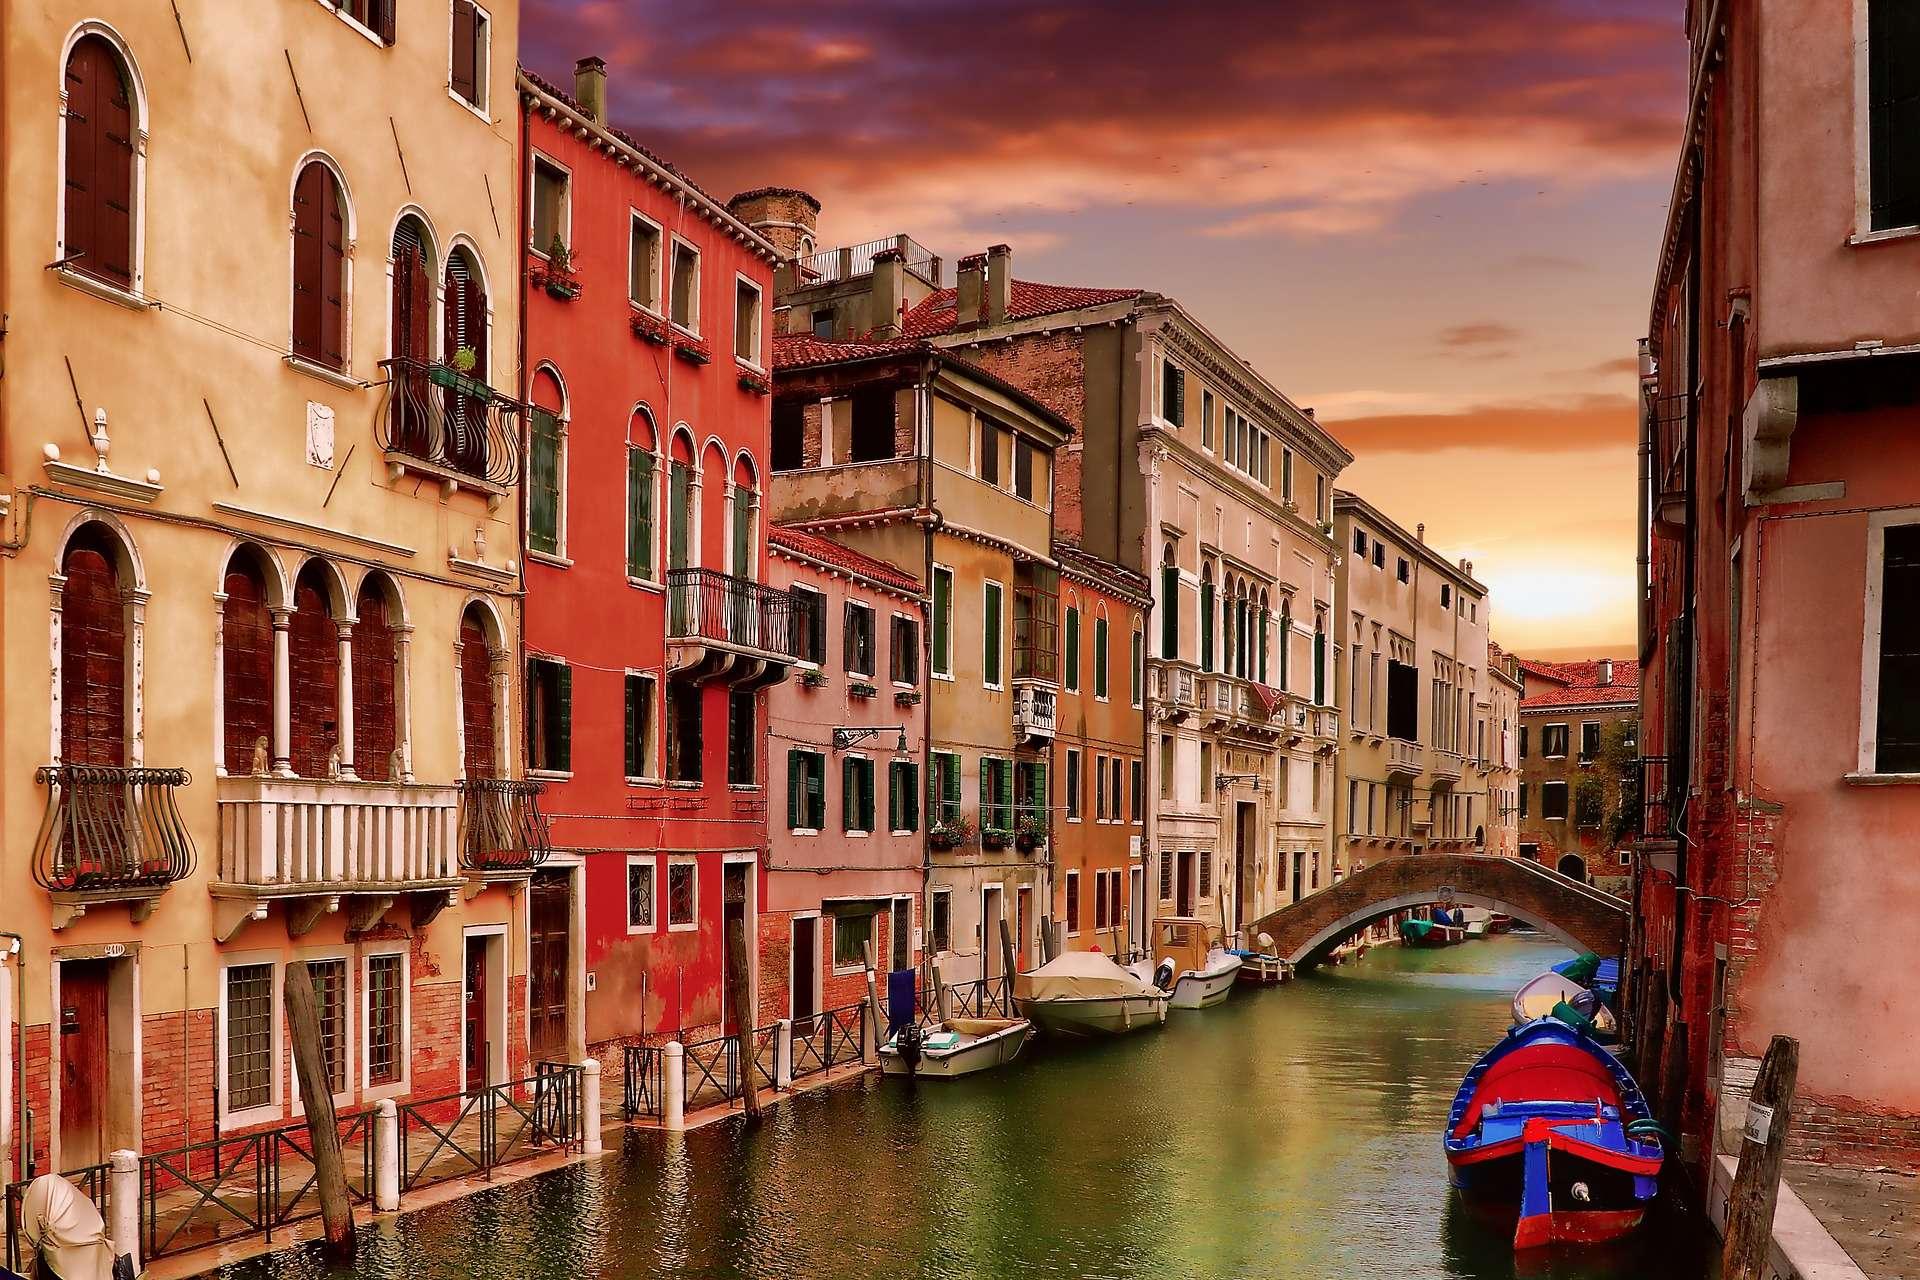 Gay-friendly b&b hotel in Venice city center